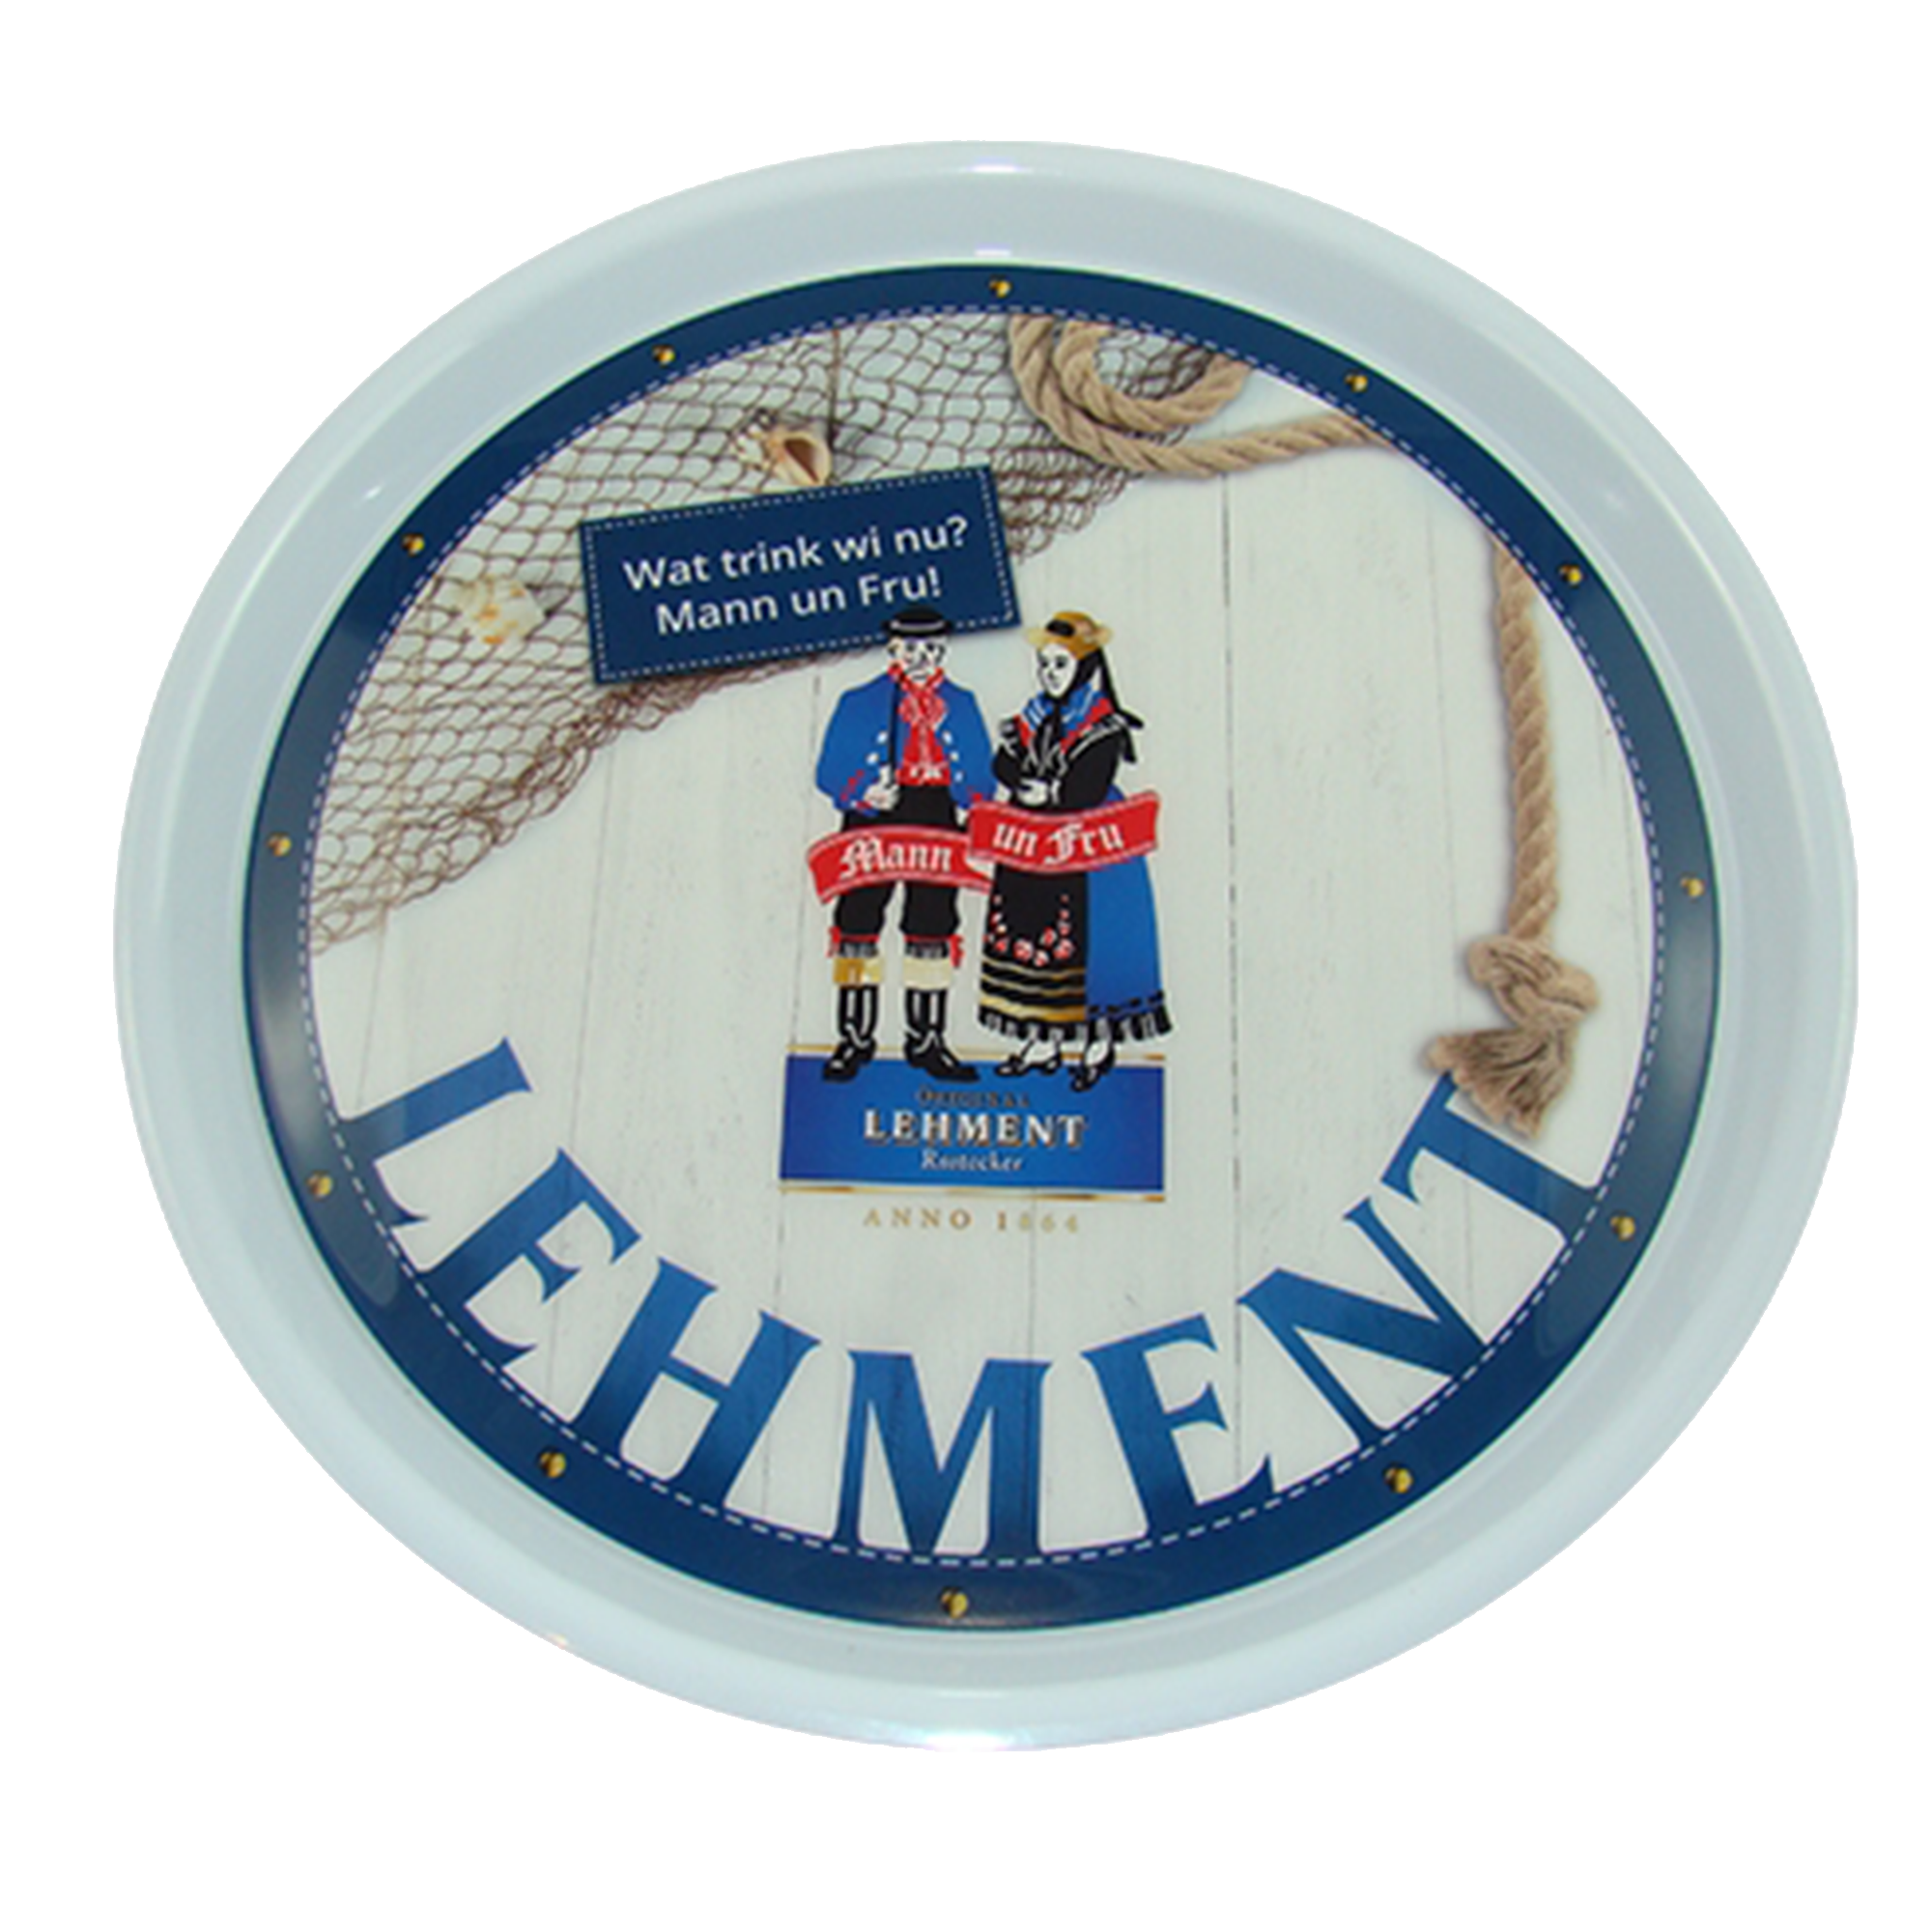 Original Lehment Rostocker Serviertablett